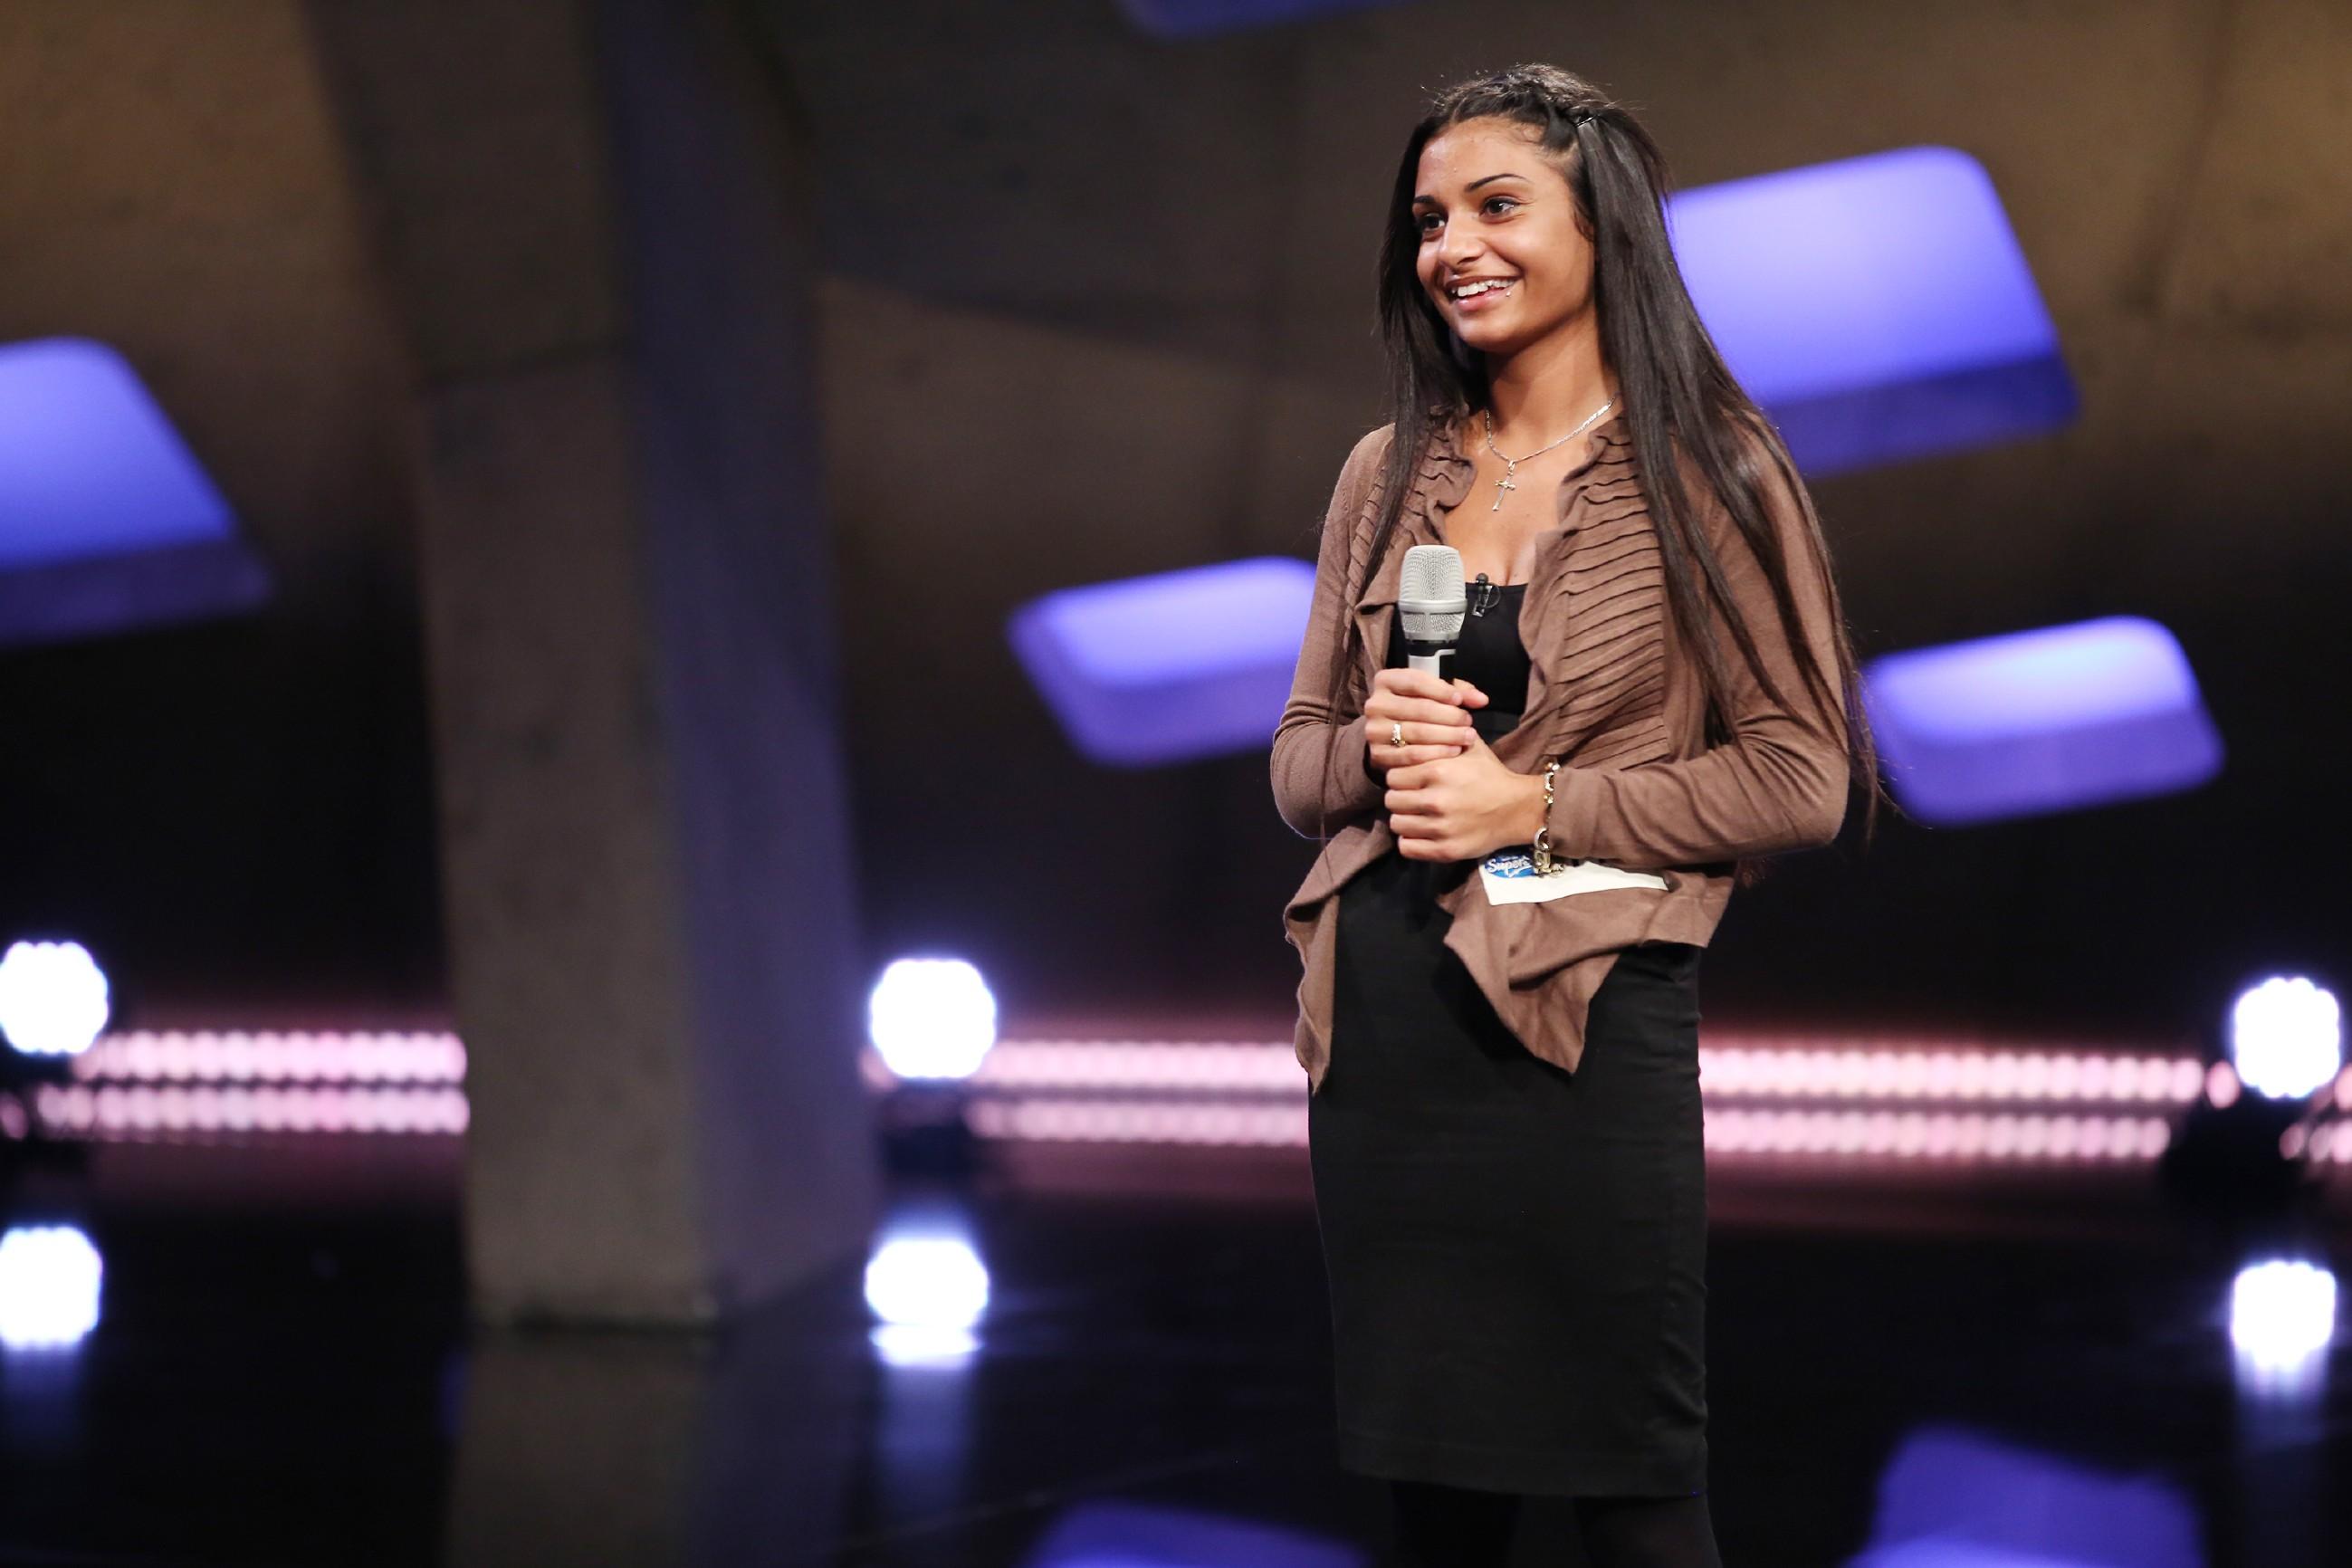 DSDS 2016 Casting 6 - Anita Wiegand aus Kiel